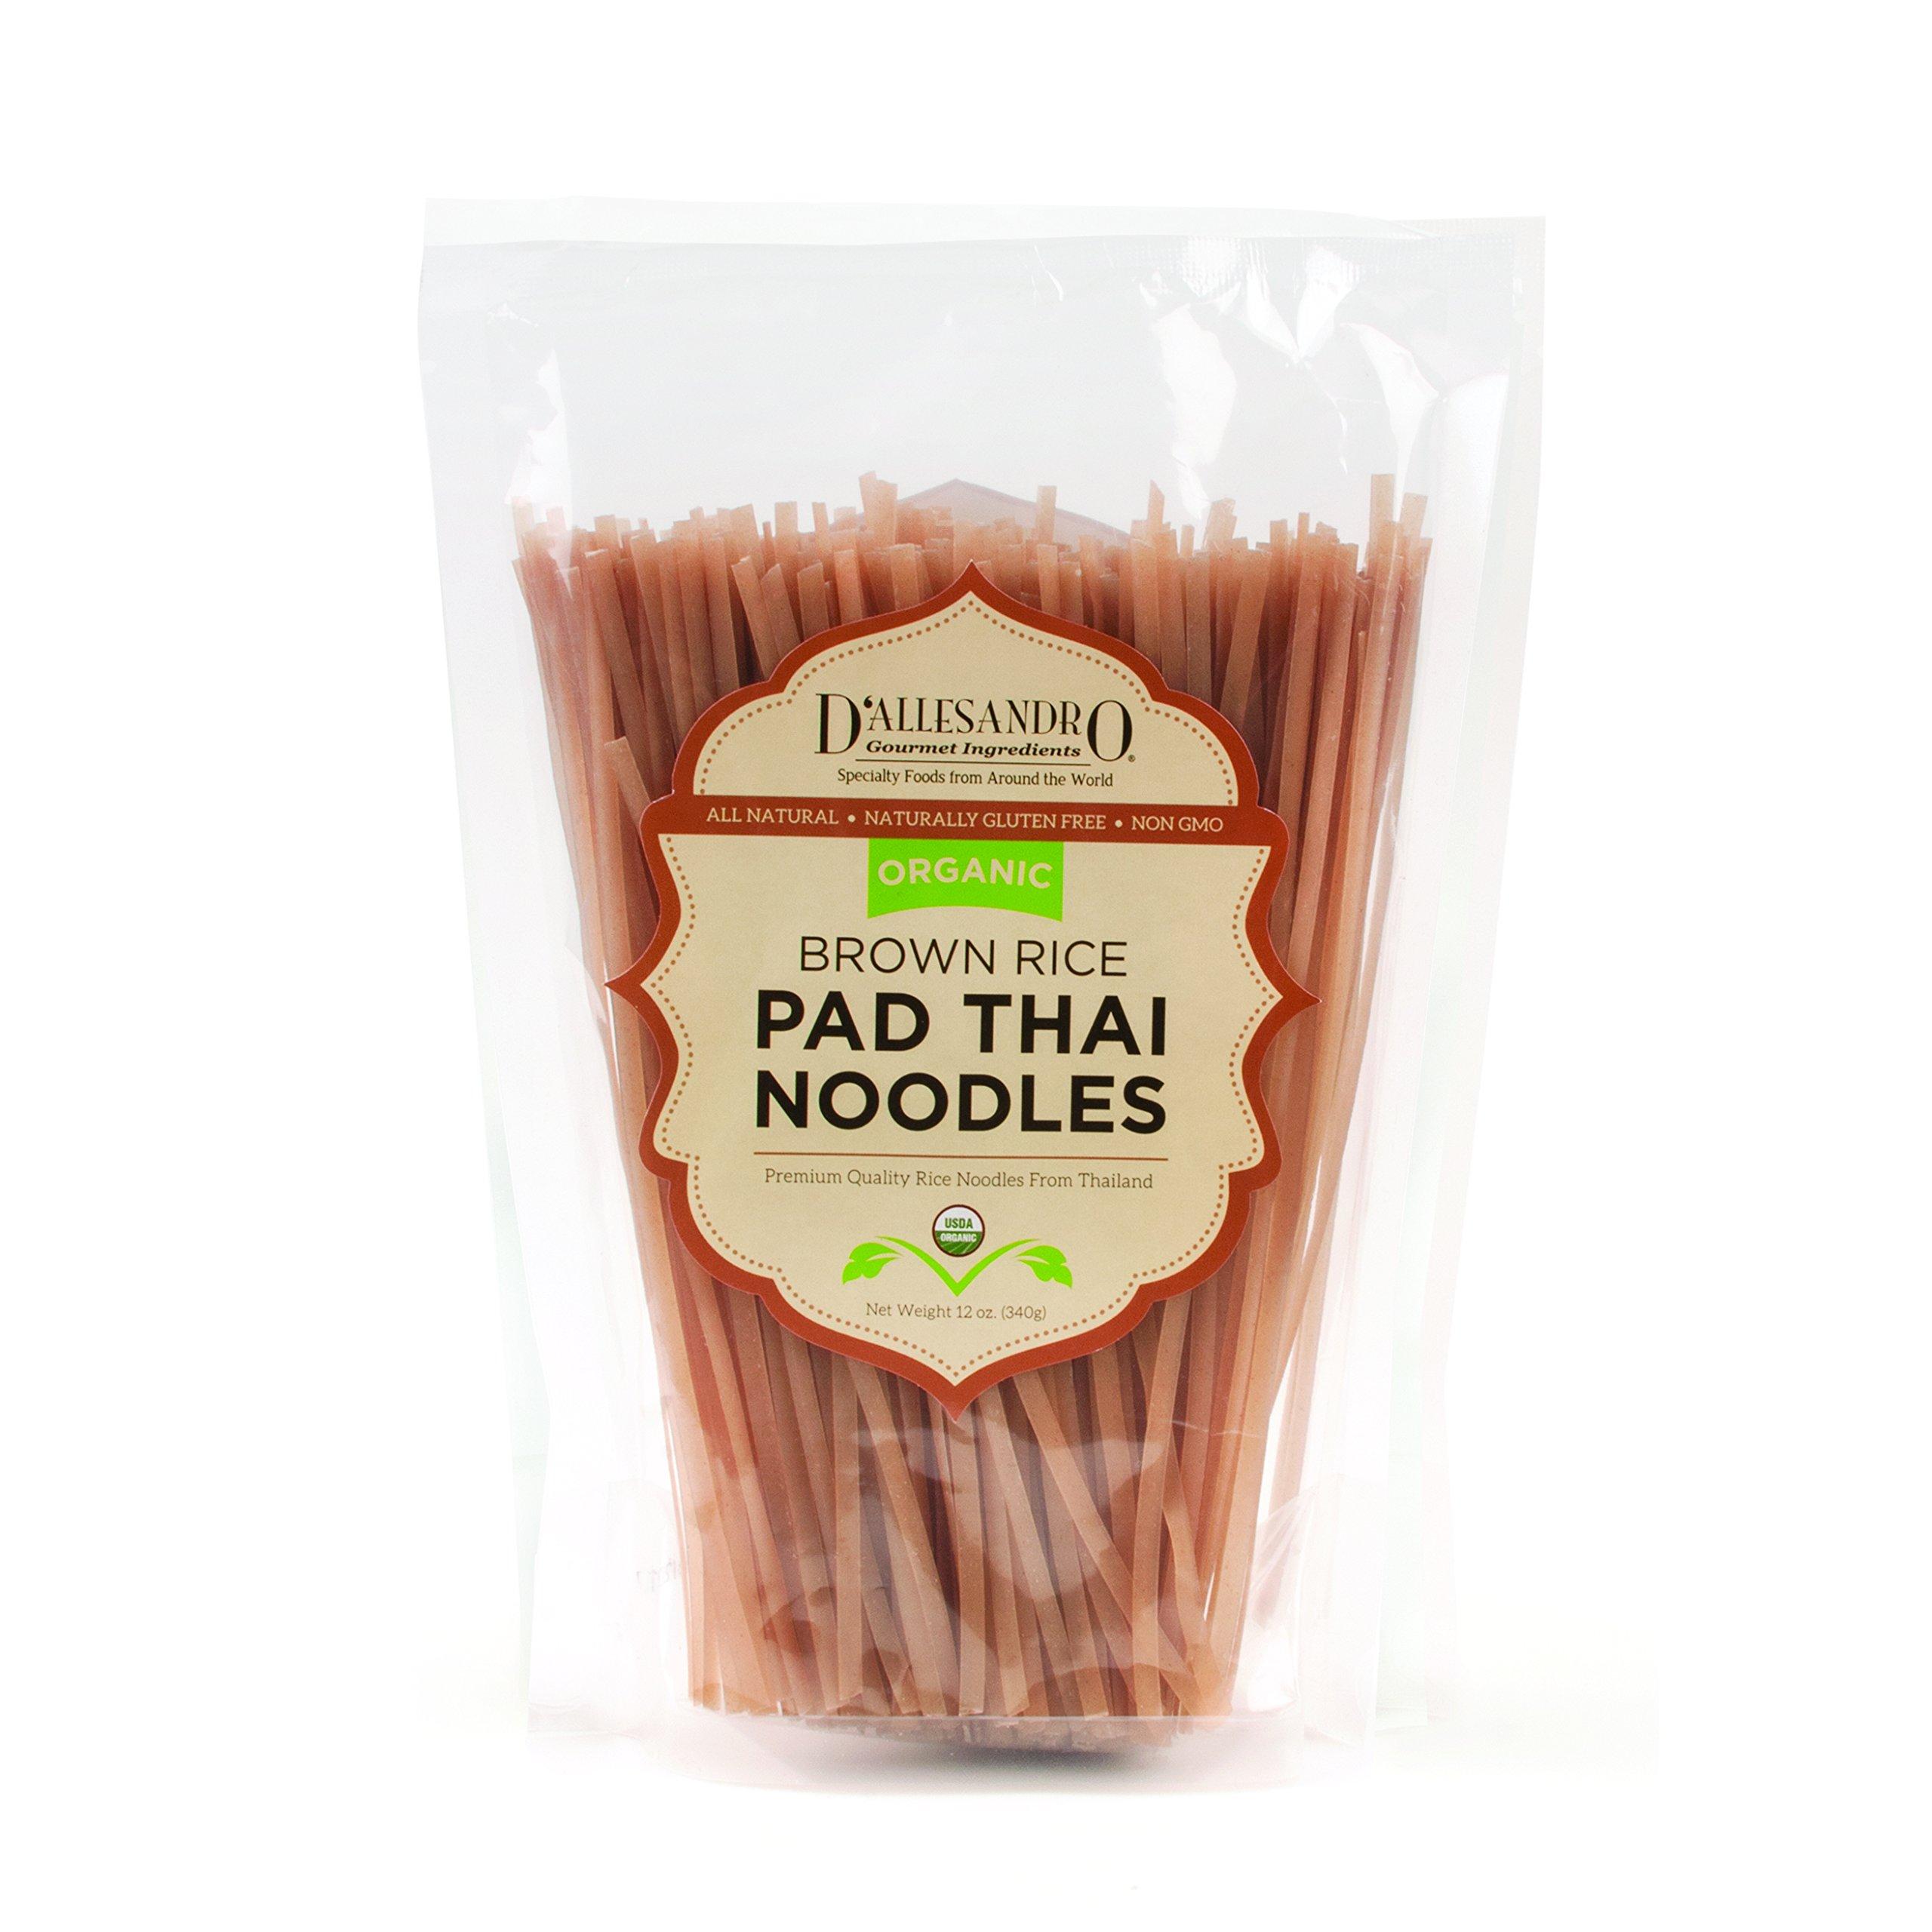 Organic Brown Rice Pad Thai Noodles, 20 / 12 Ounce Box Case